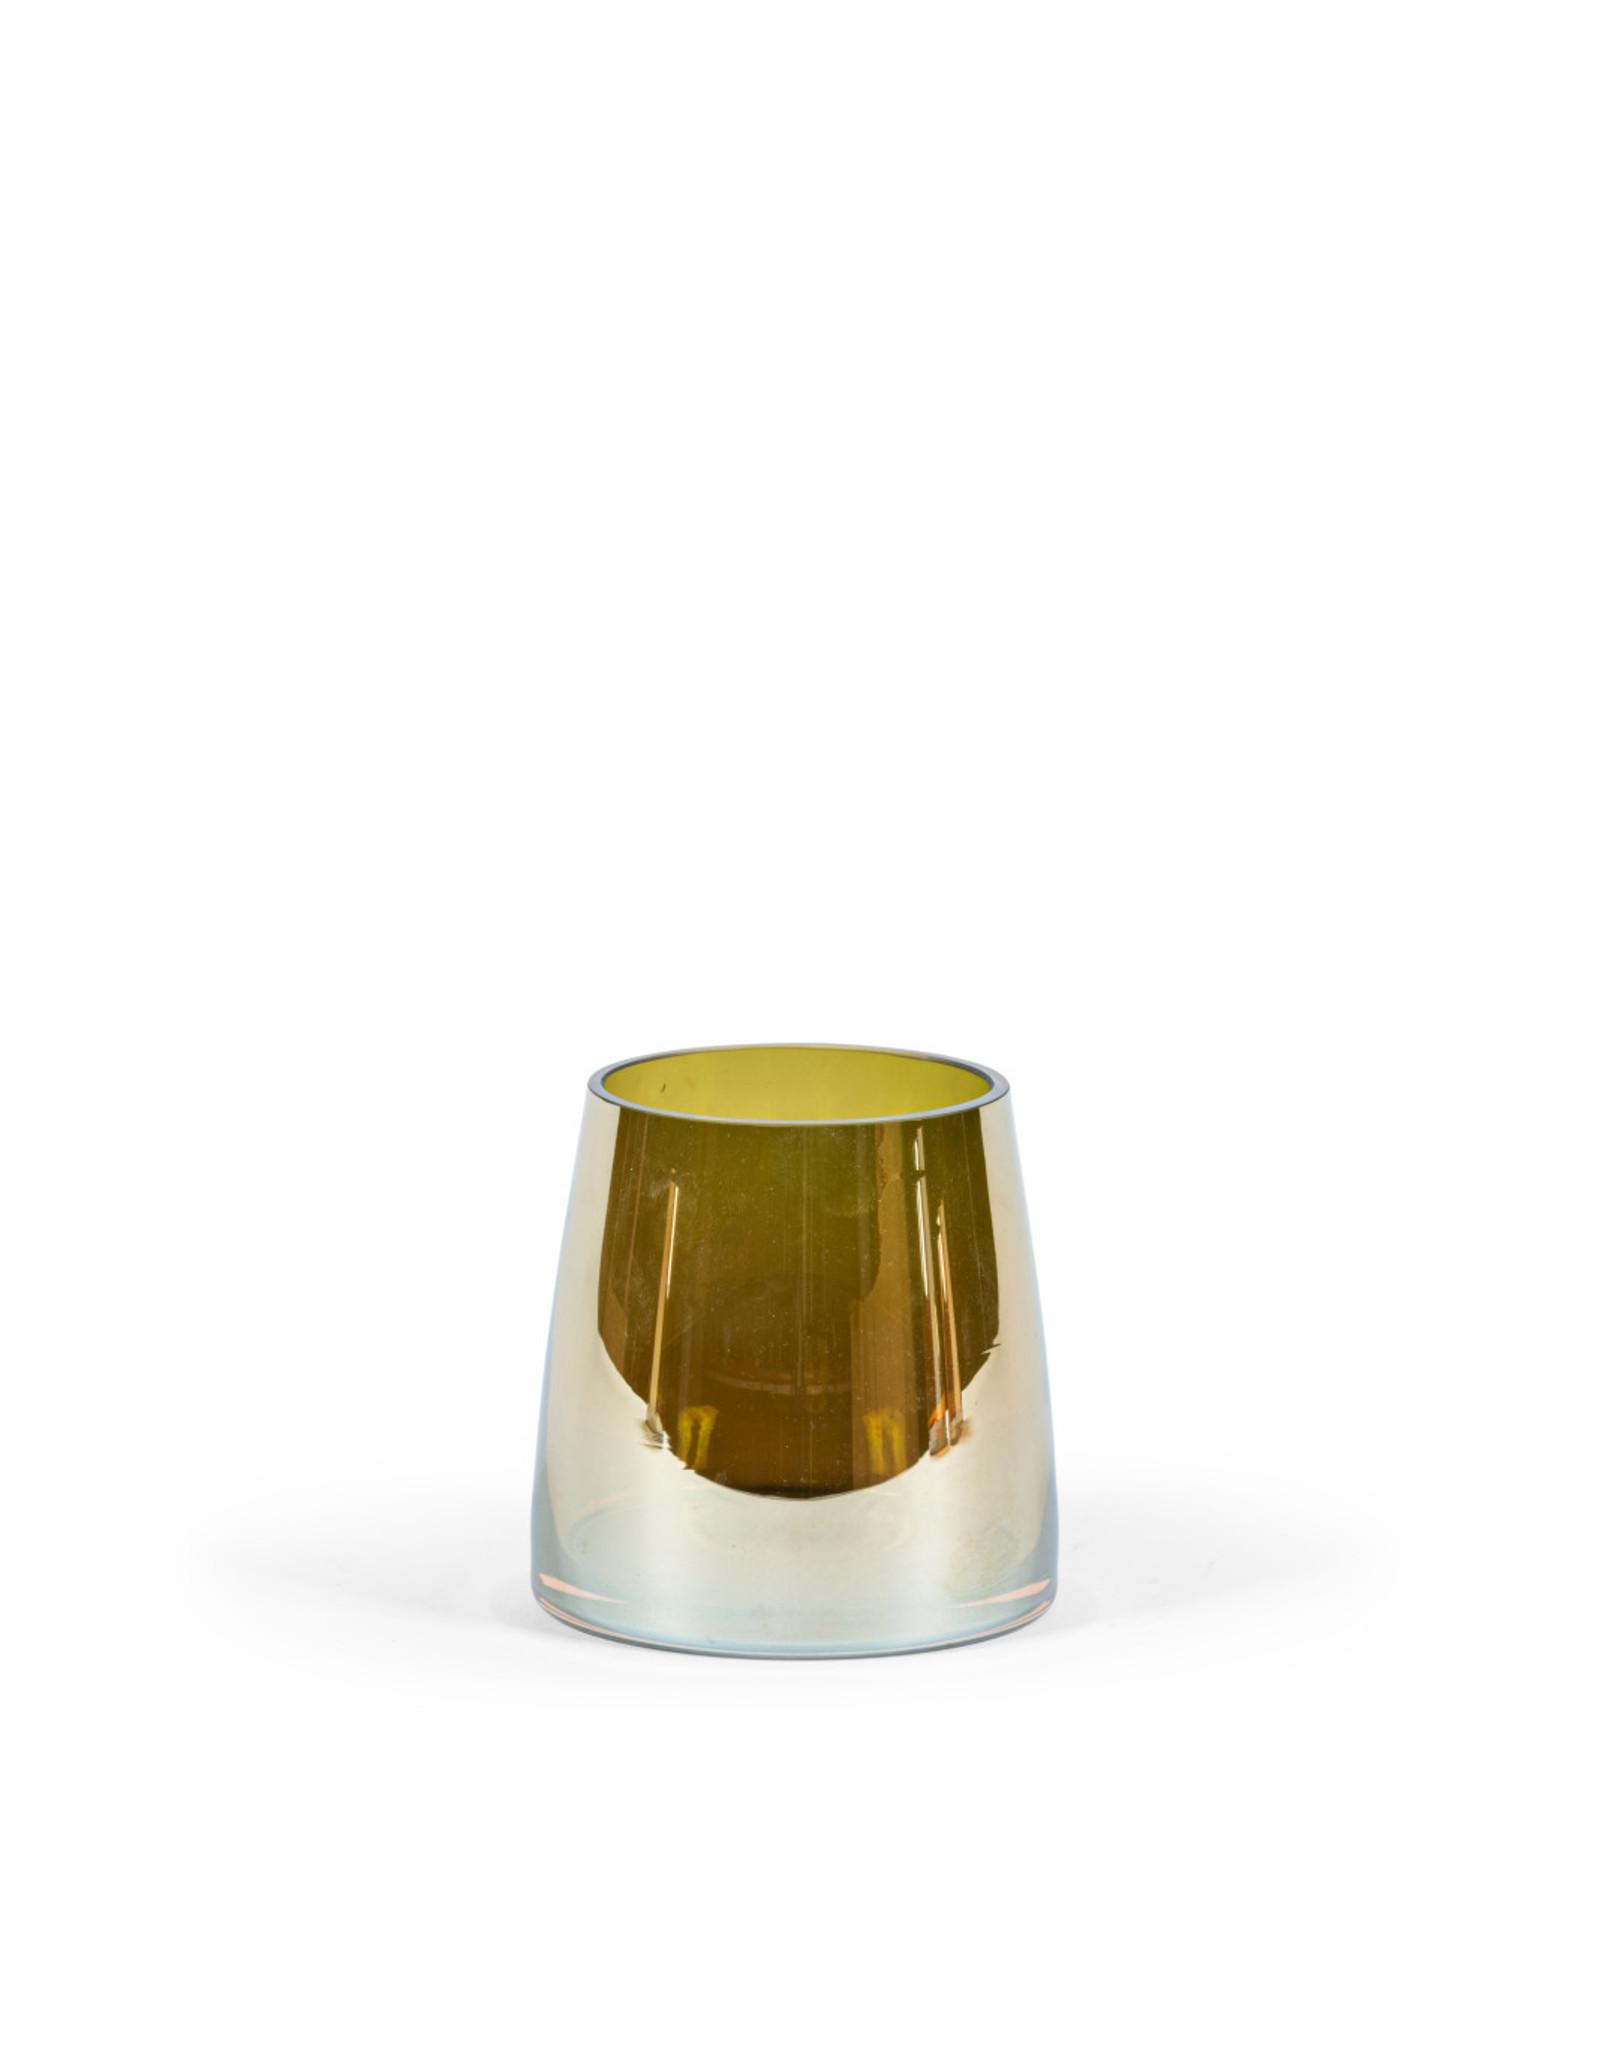 Dekocandle Theelicht Olive luster Small